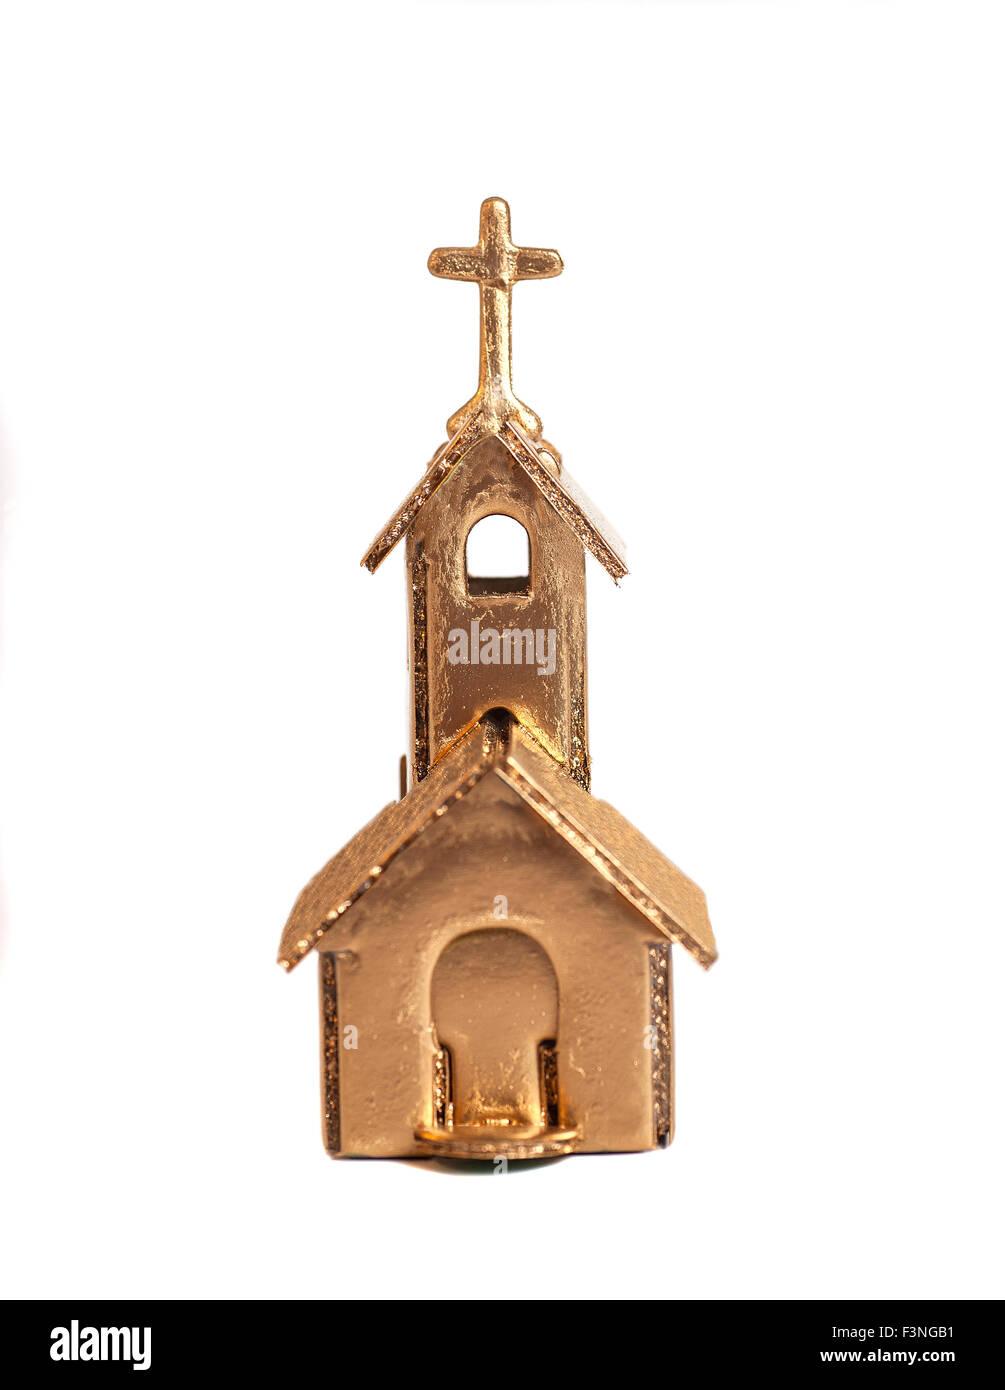 Golden Church - Stock Image